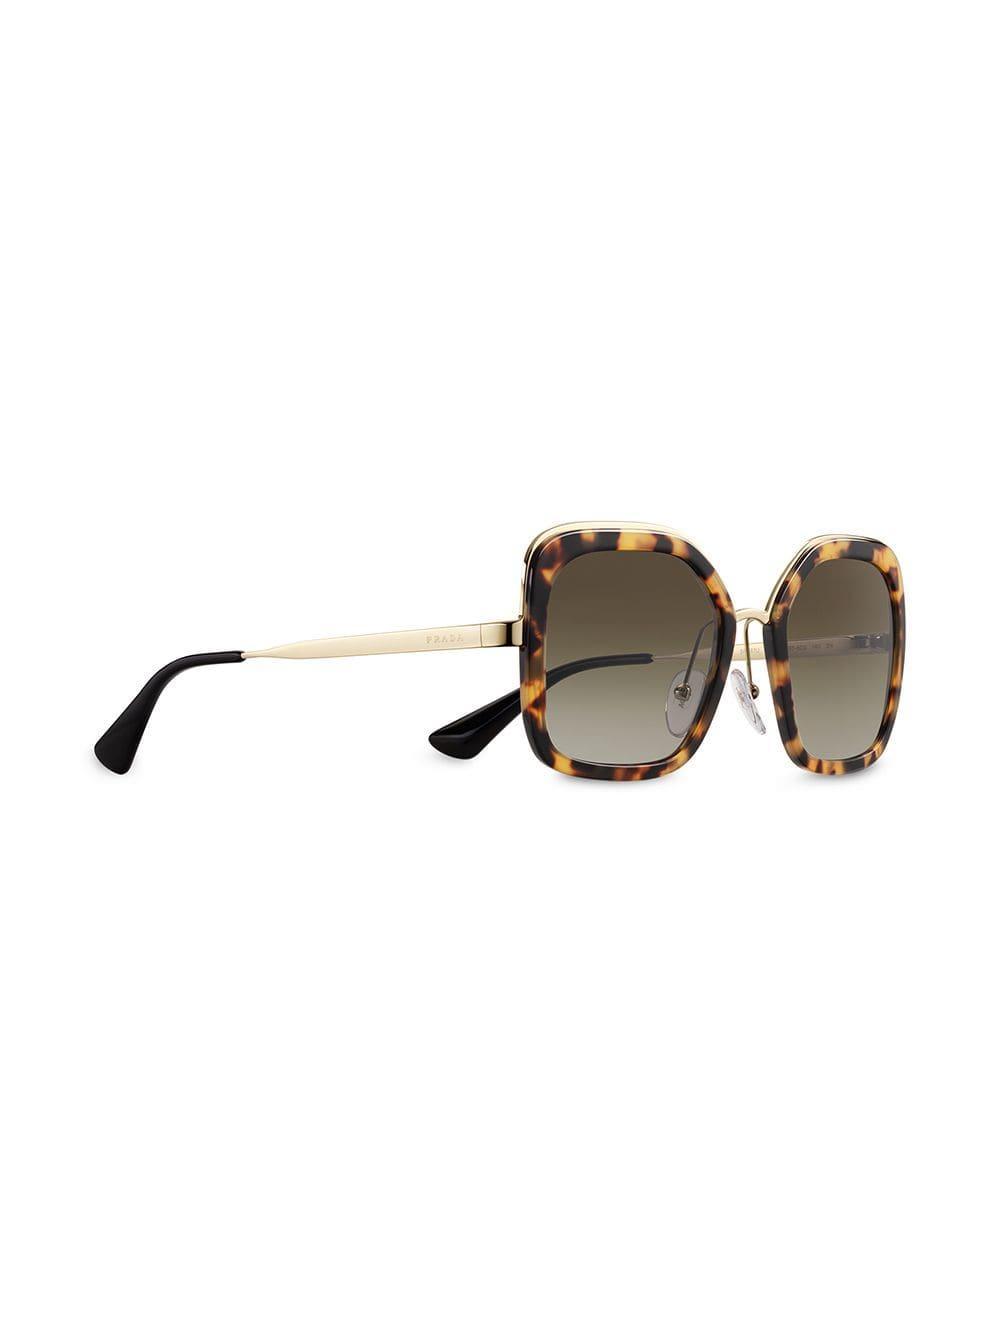 131d6c7e97057 Lyst - Prada Oversized Square Sunglasses in Brown